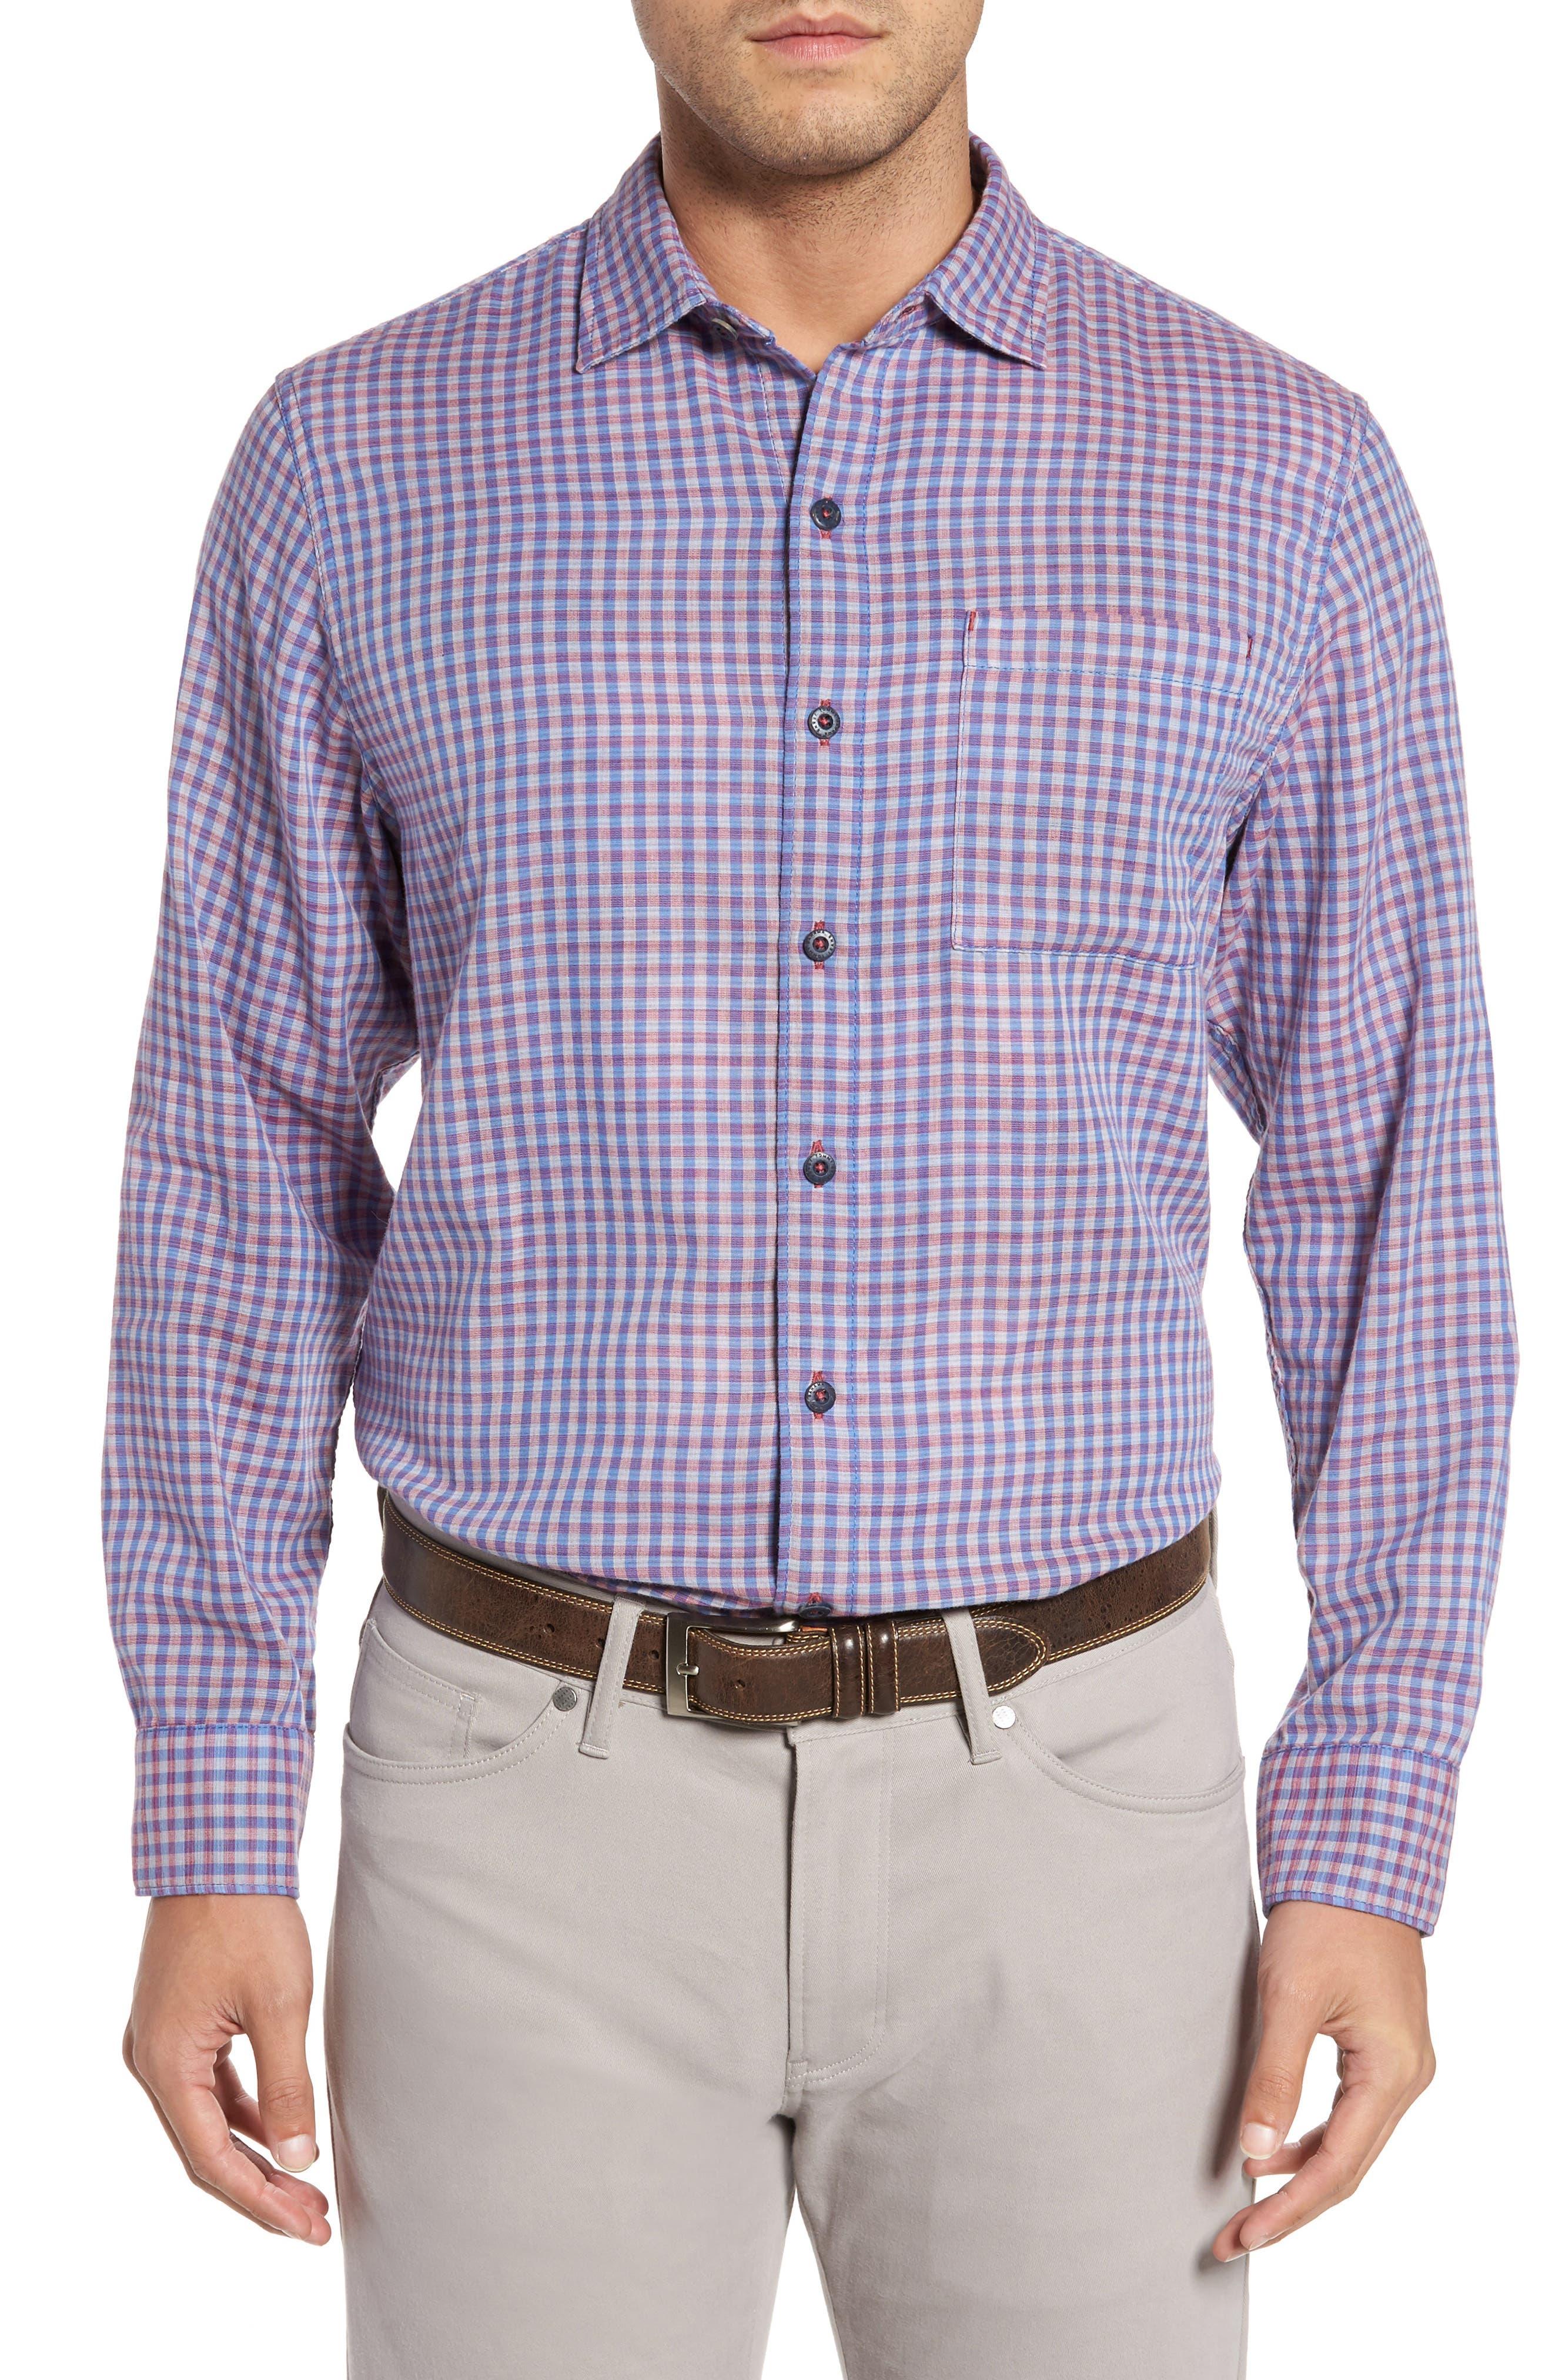 Dual Lux Gingham Sport Shirt,                         Main,                         color, Bering Blue